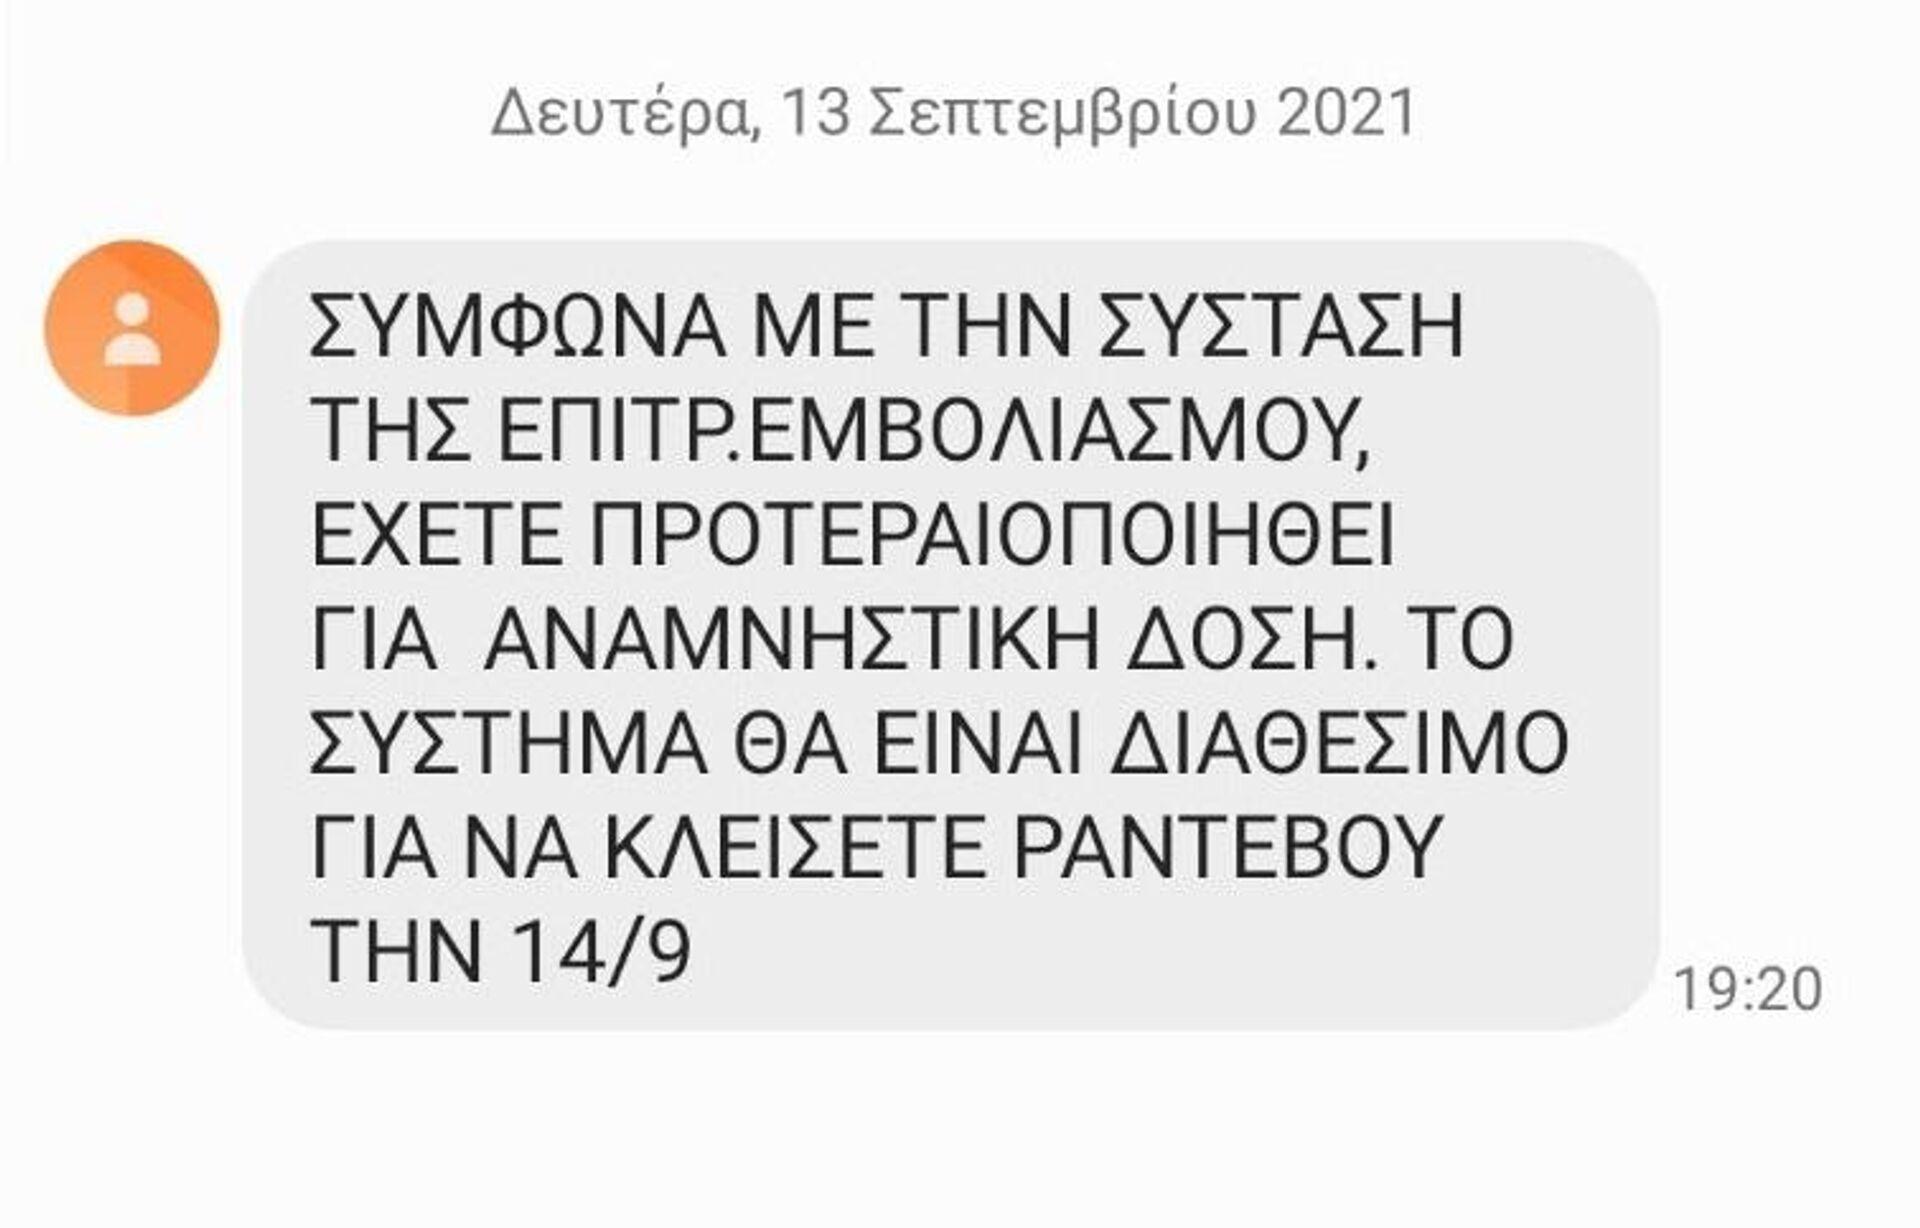 SMS για τρίτη δόση εμβολίου - Sputnik Ελλάδα, 1920, 13.09.2021